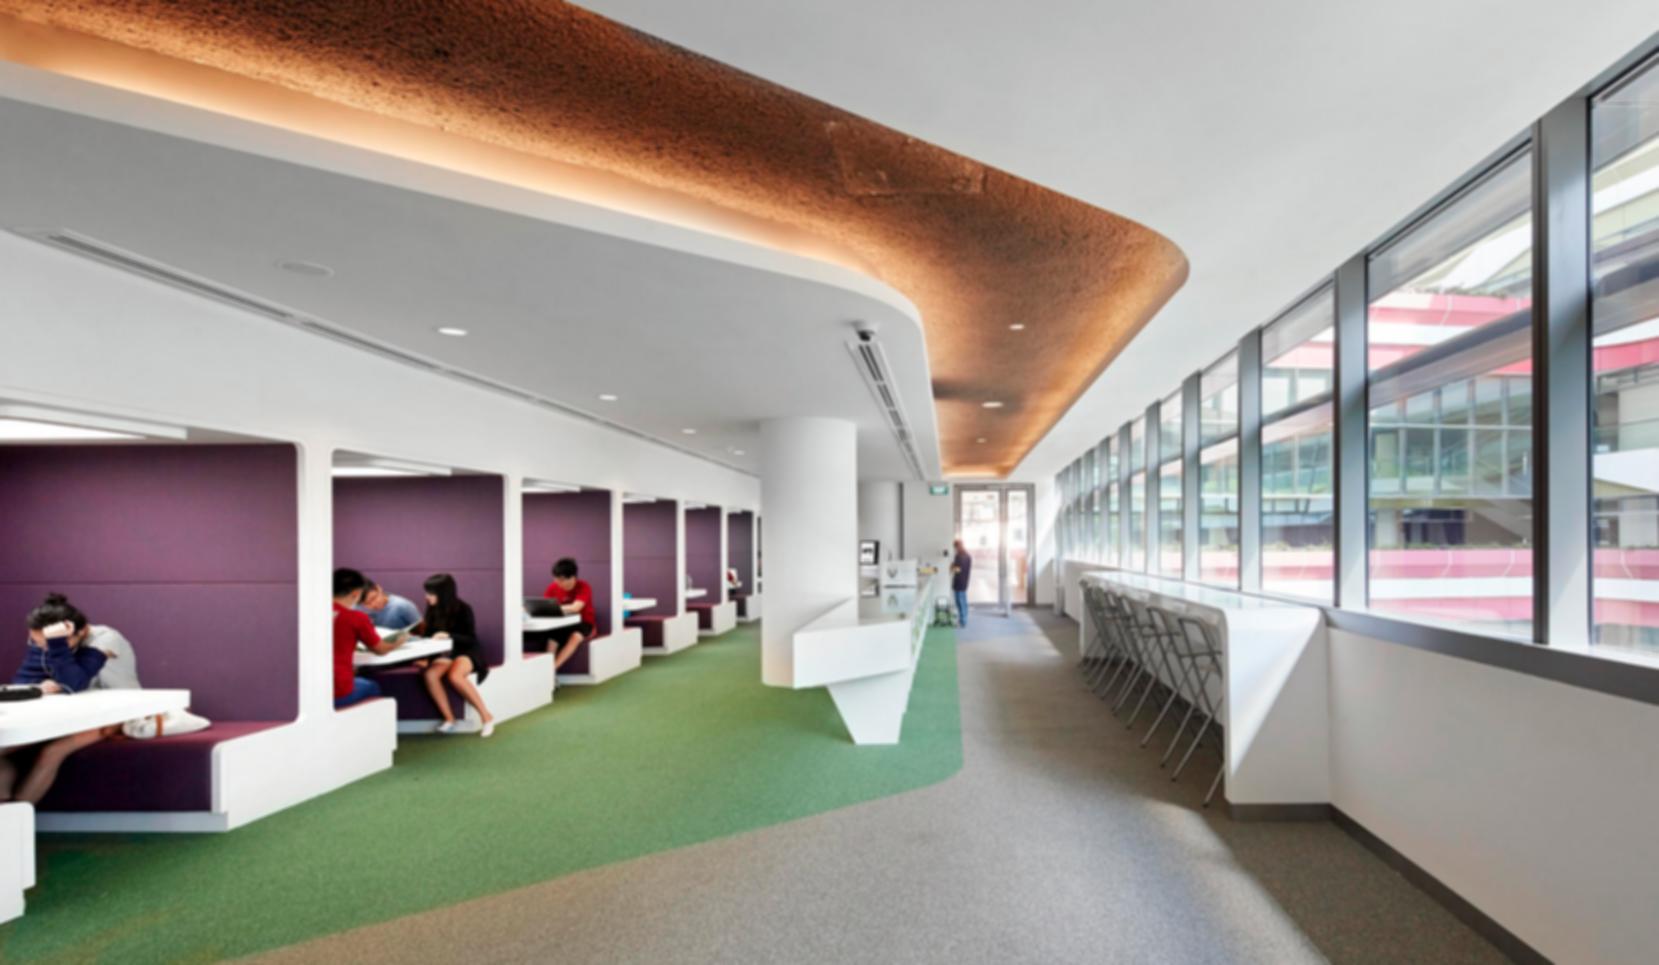 Singapore university of technology and design interior for Interior design colleges and universities